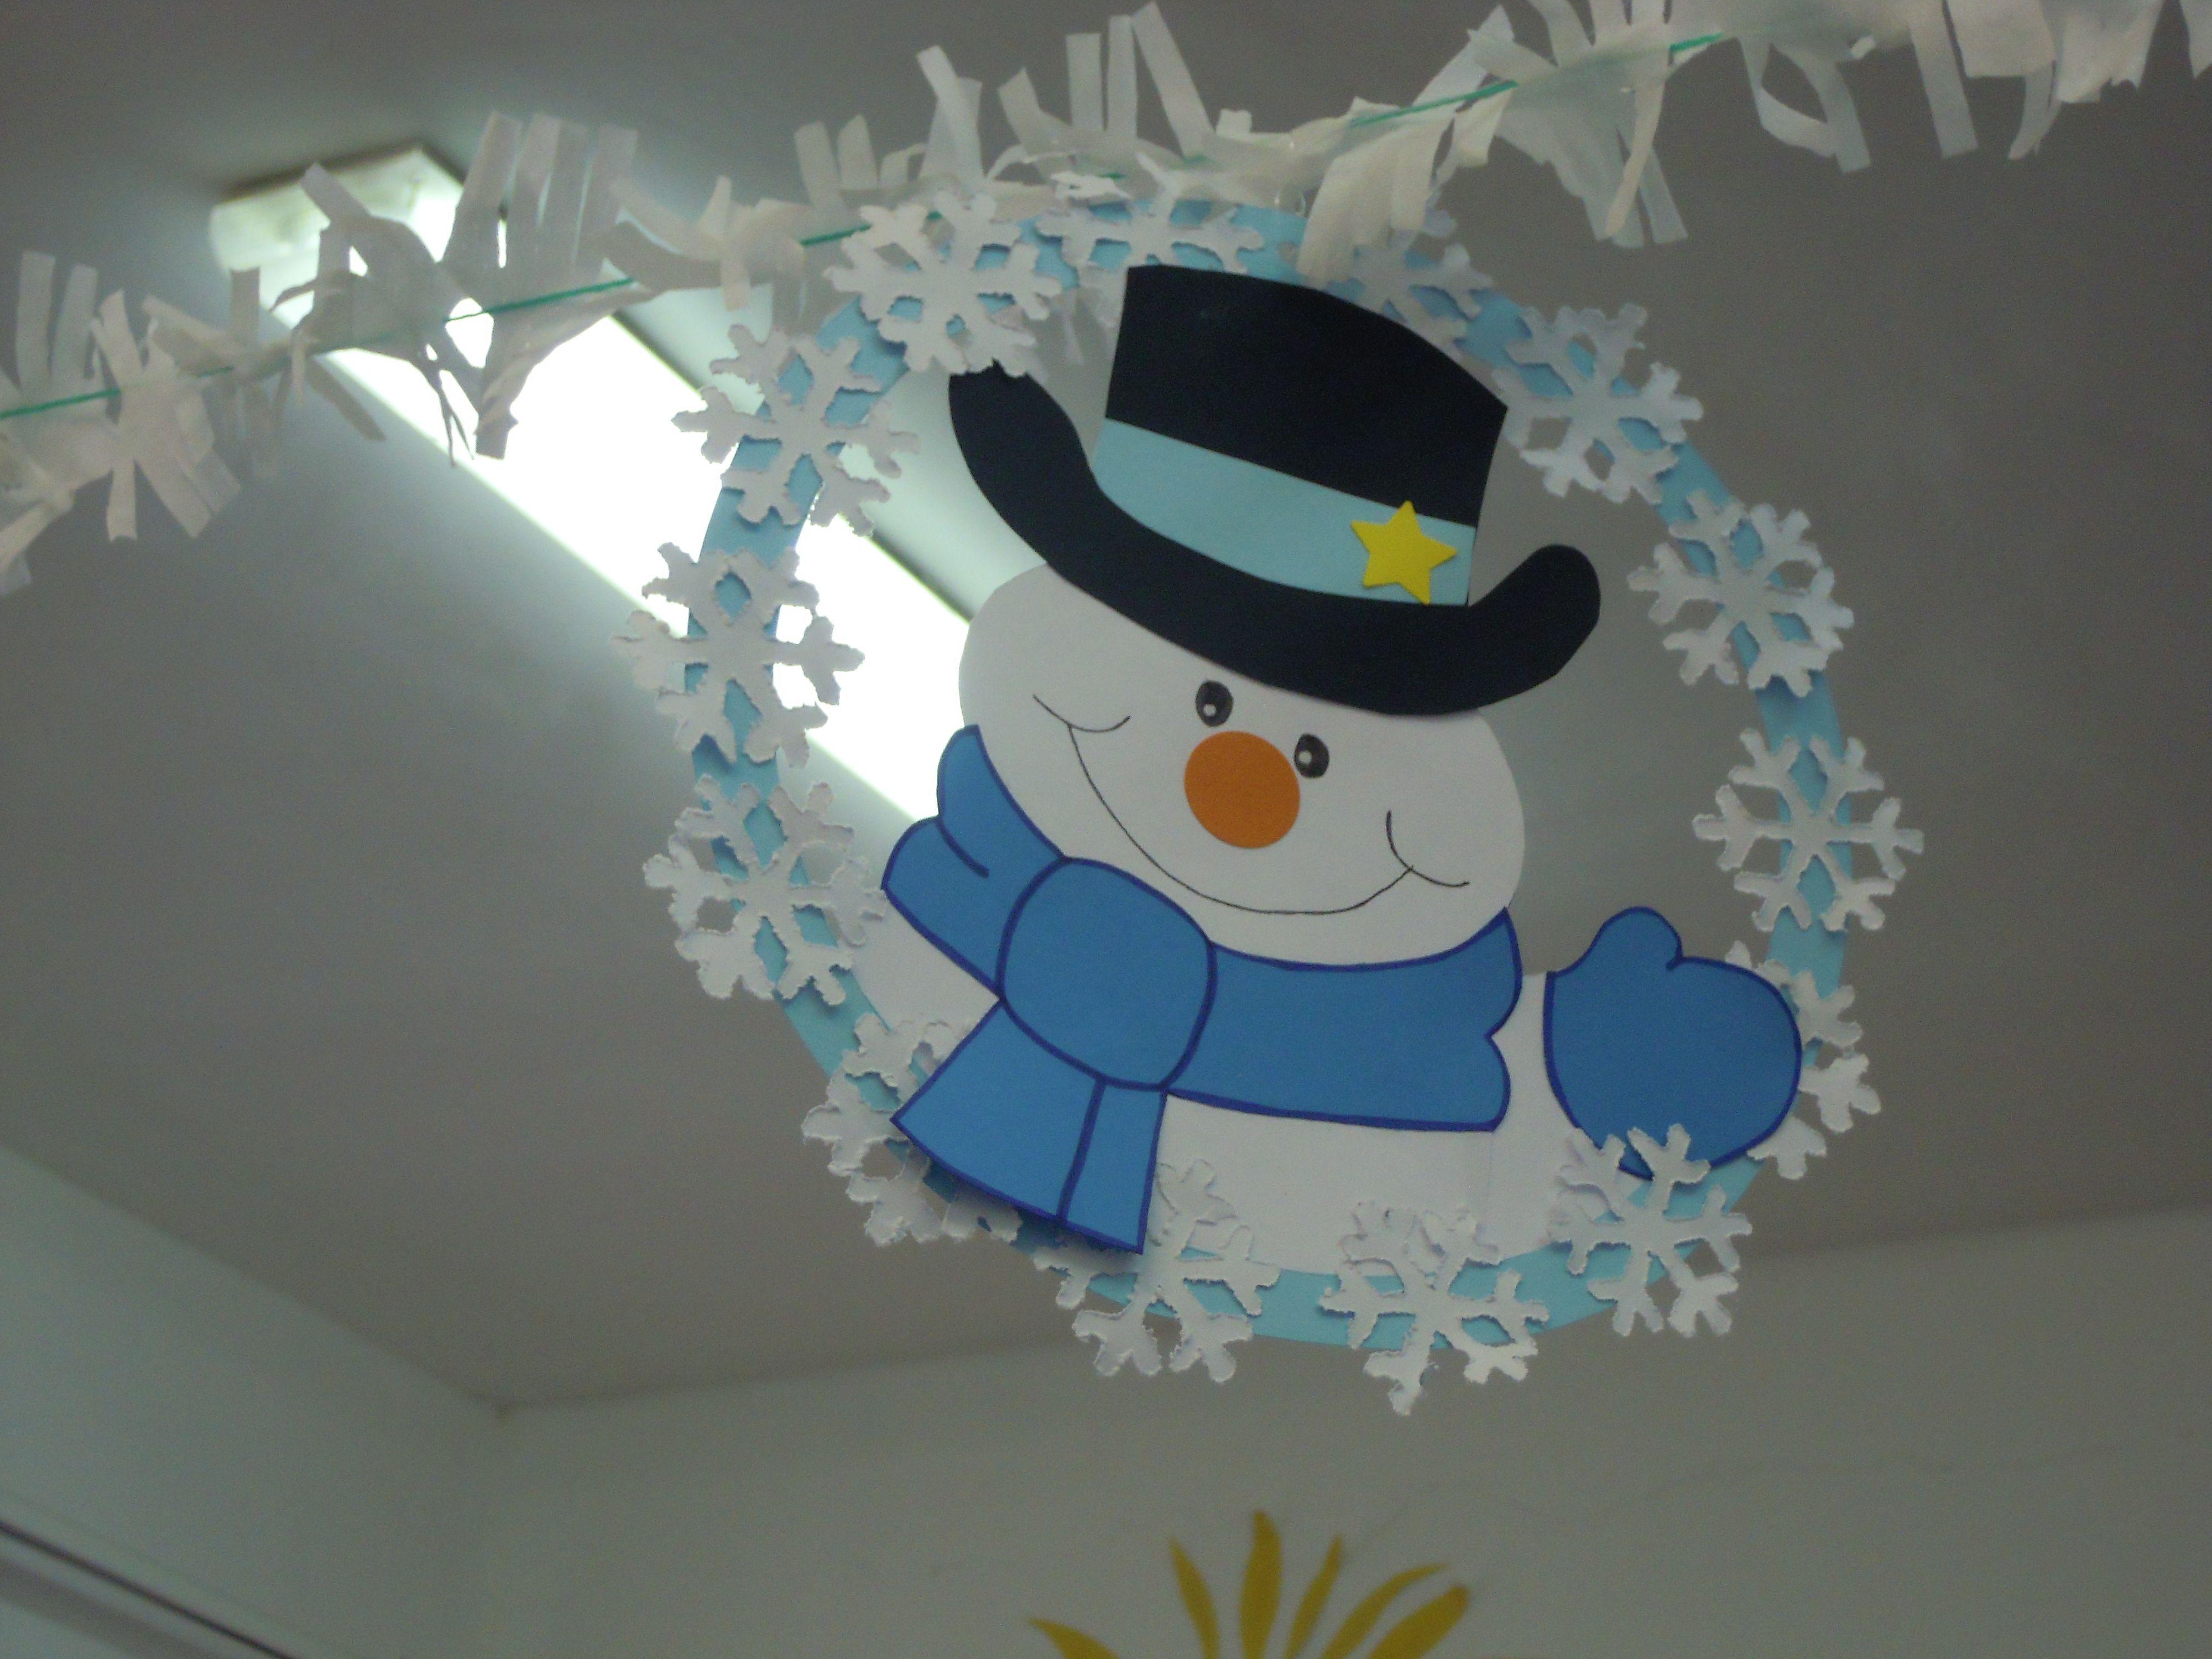 Addobbi aula inverno winter christmas winter crafts for Addobbi aula